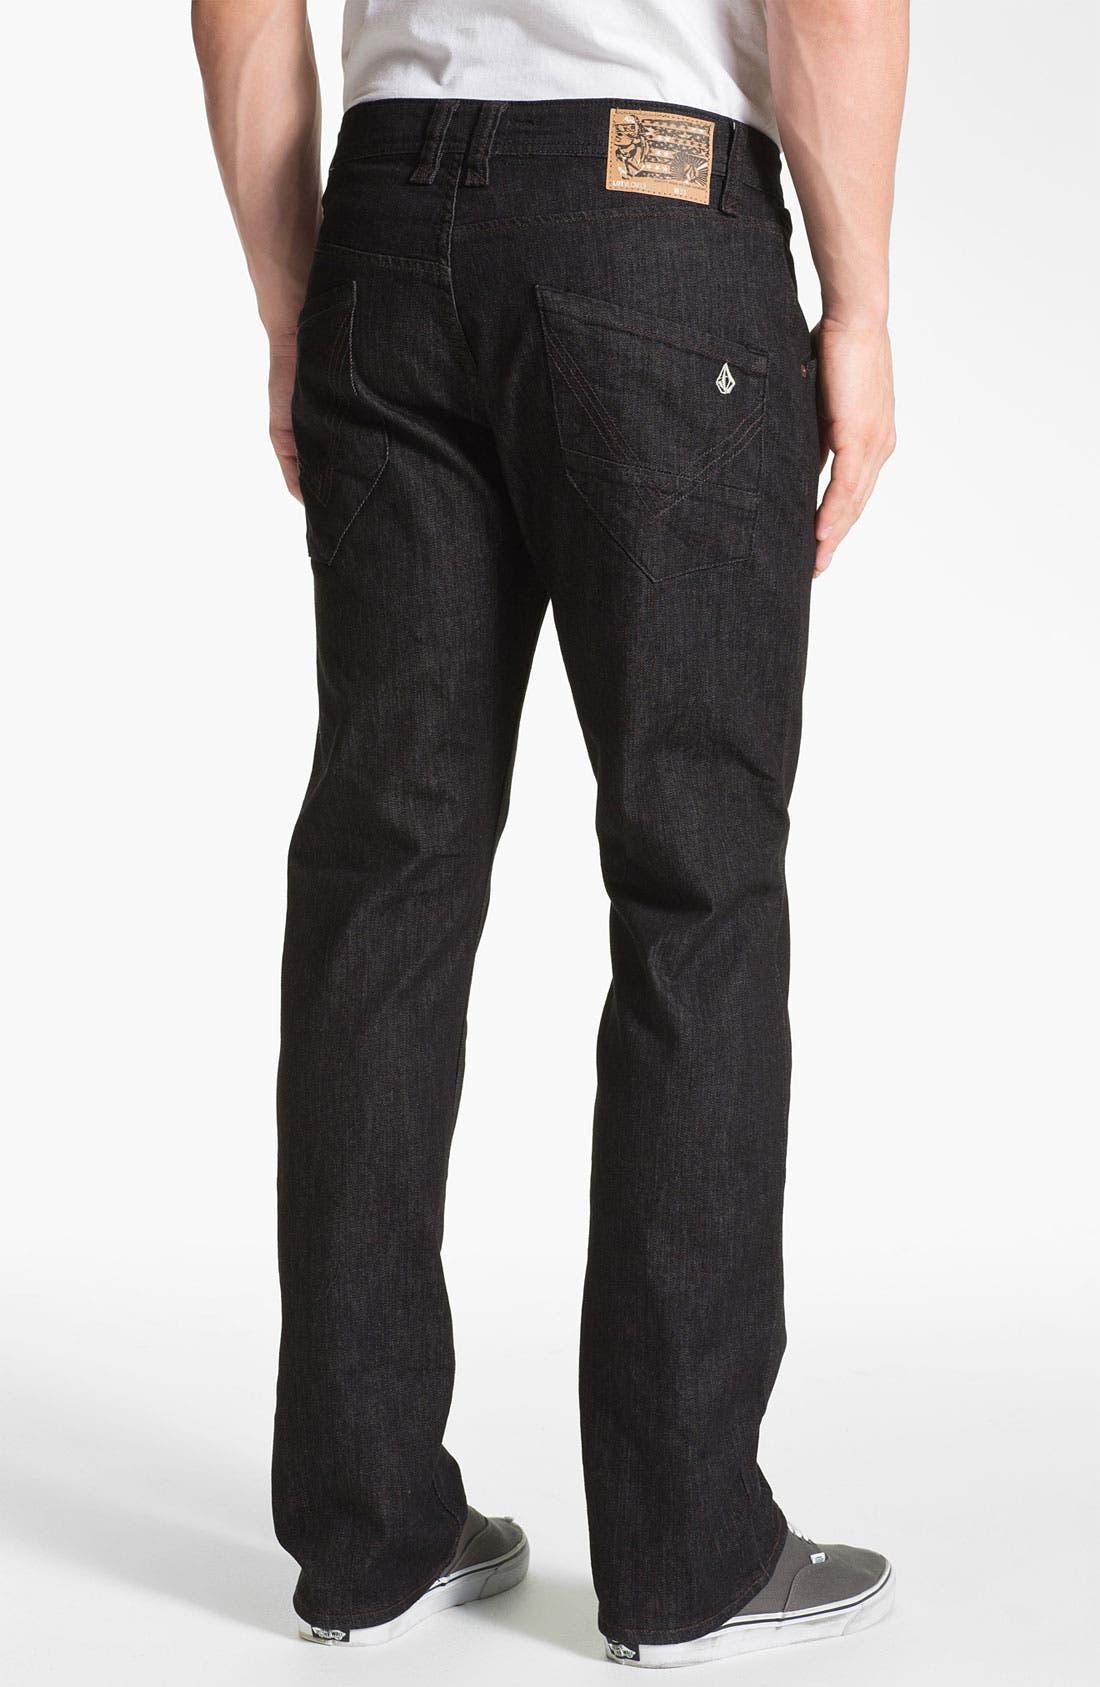 Main Image - Volcom 'Nova' Slim Straight Leg Jeans (Black Rinse) (Online Only)